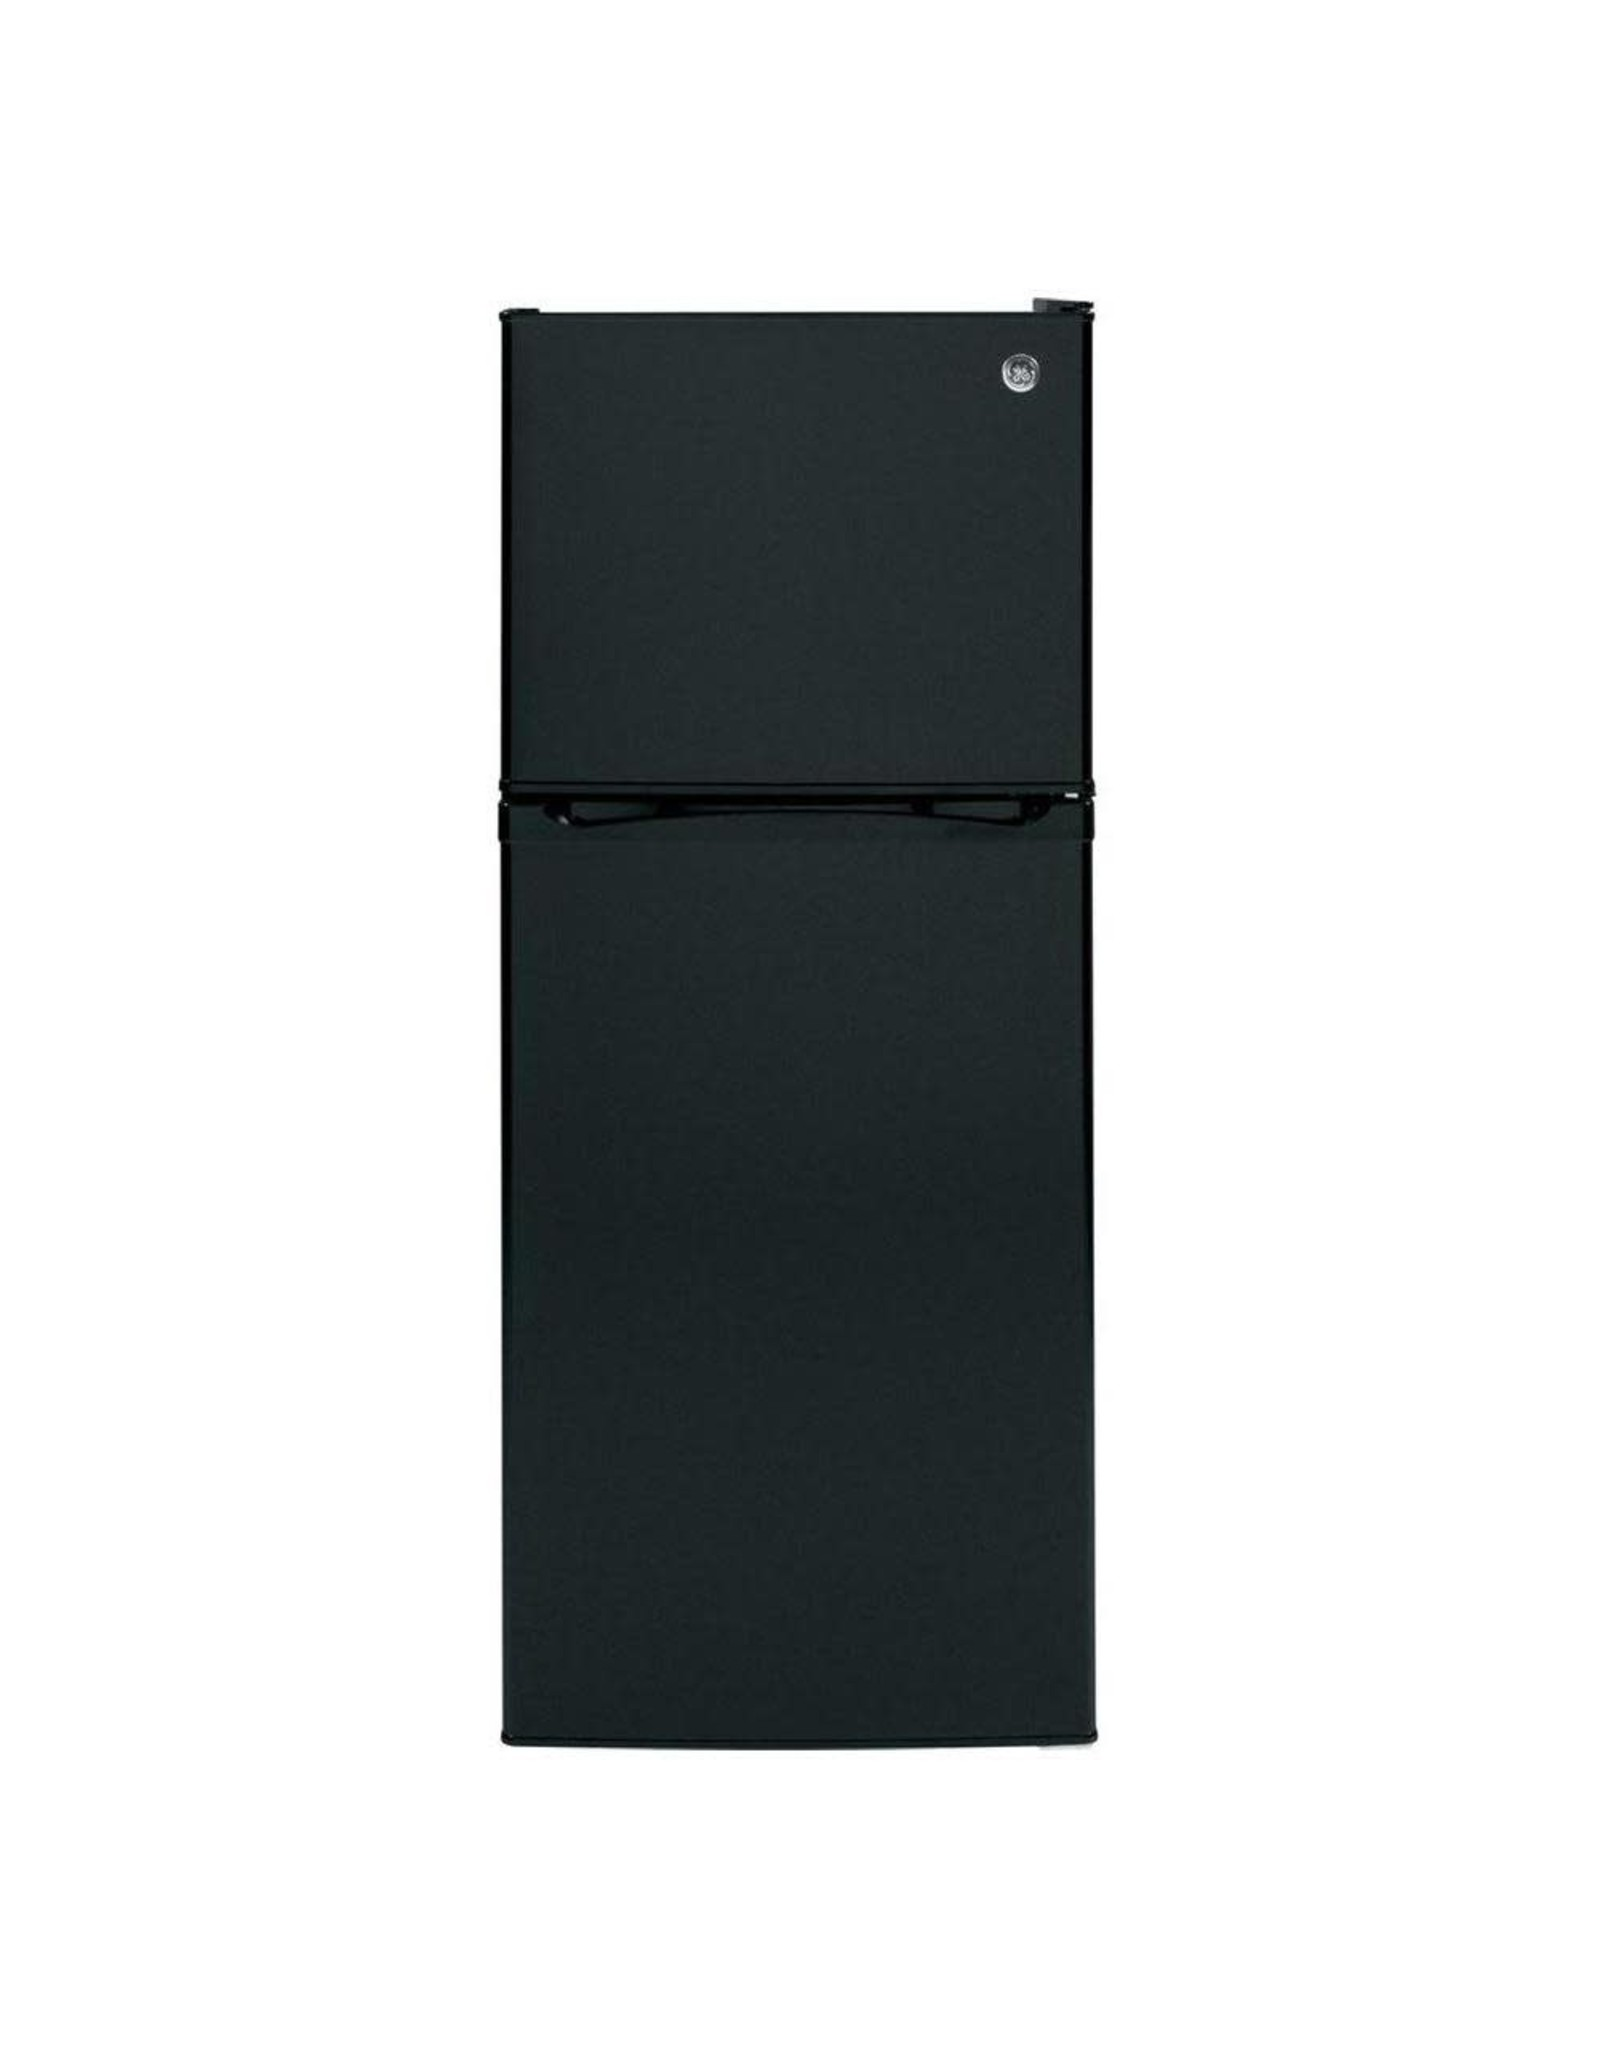 GE GPE12FGKBB 11.6 cu. ft. Top Freezer Refrigerator in Black, ENERGY STAR